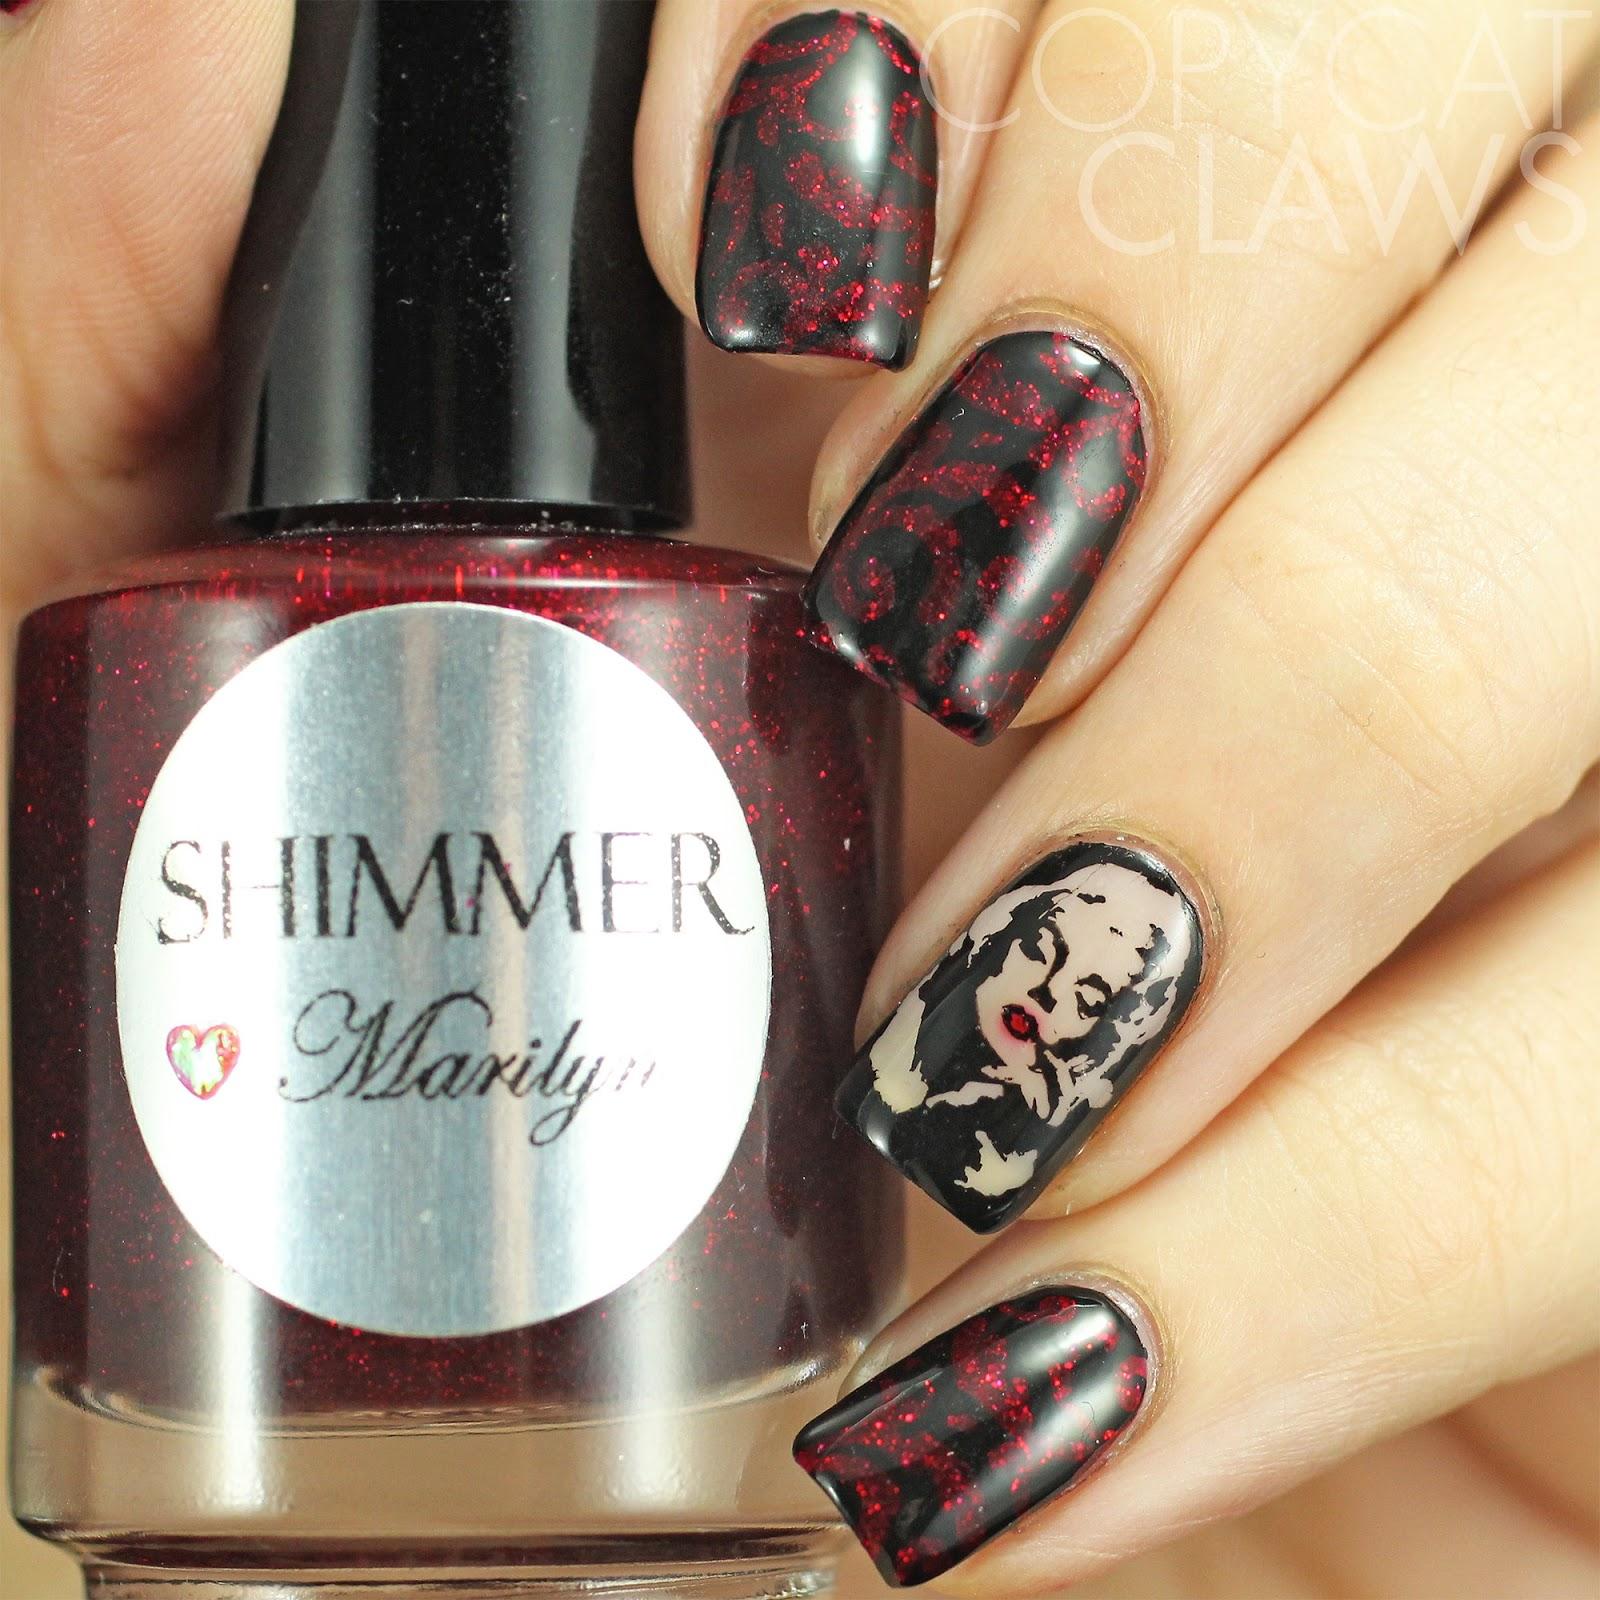 Copycat Claws: The Digit-al Dozen does Vampy: Marilyn Monroe Nail Art